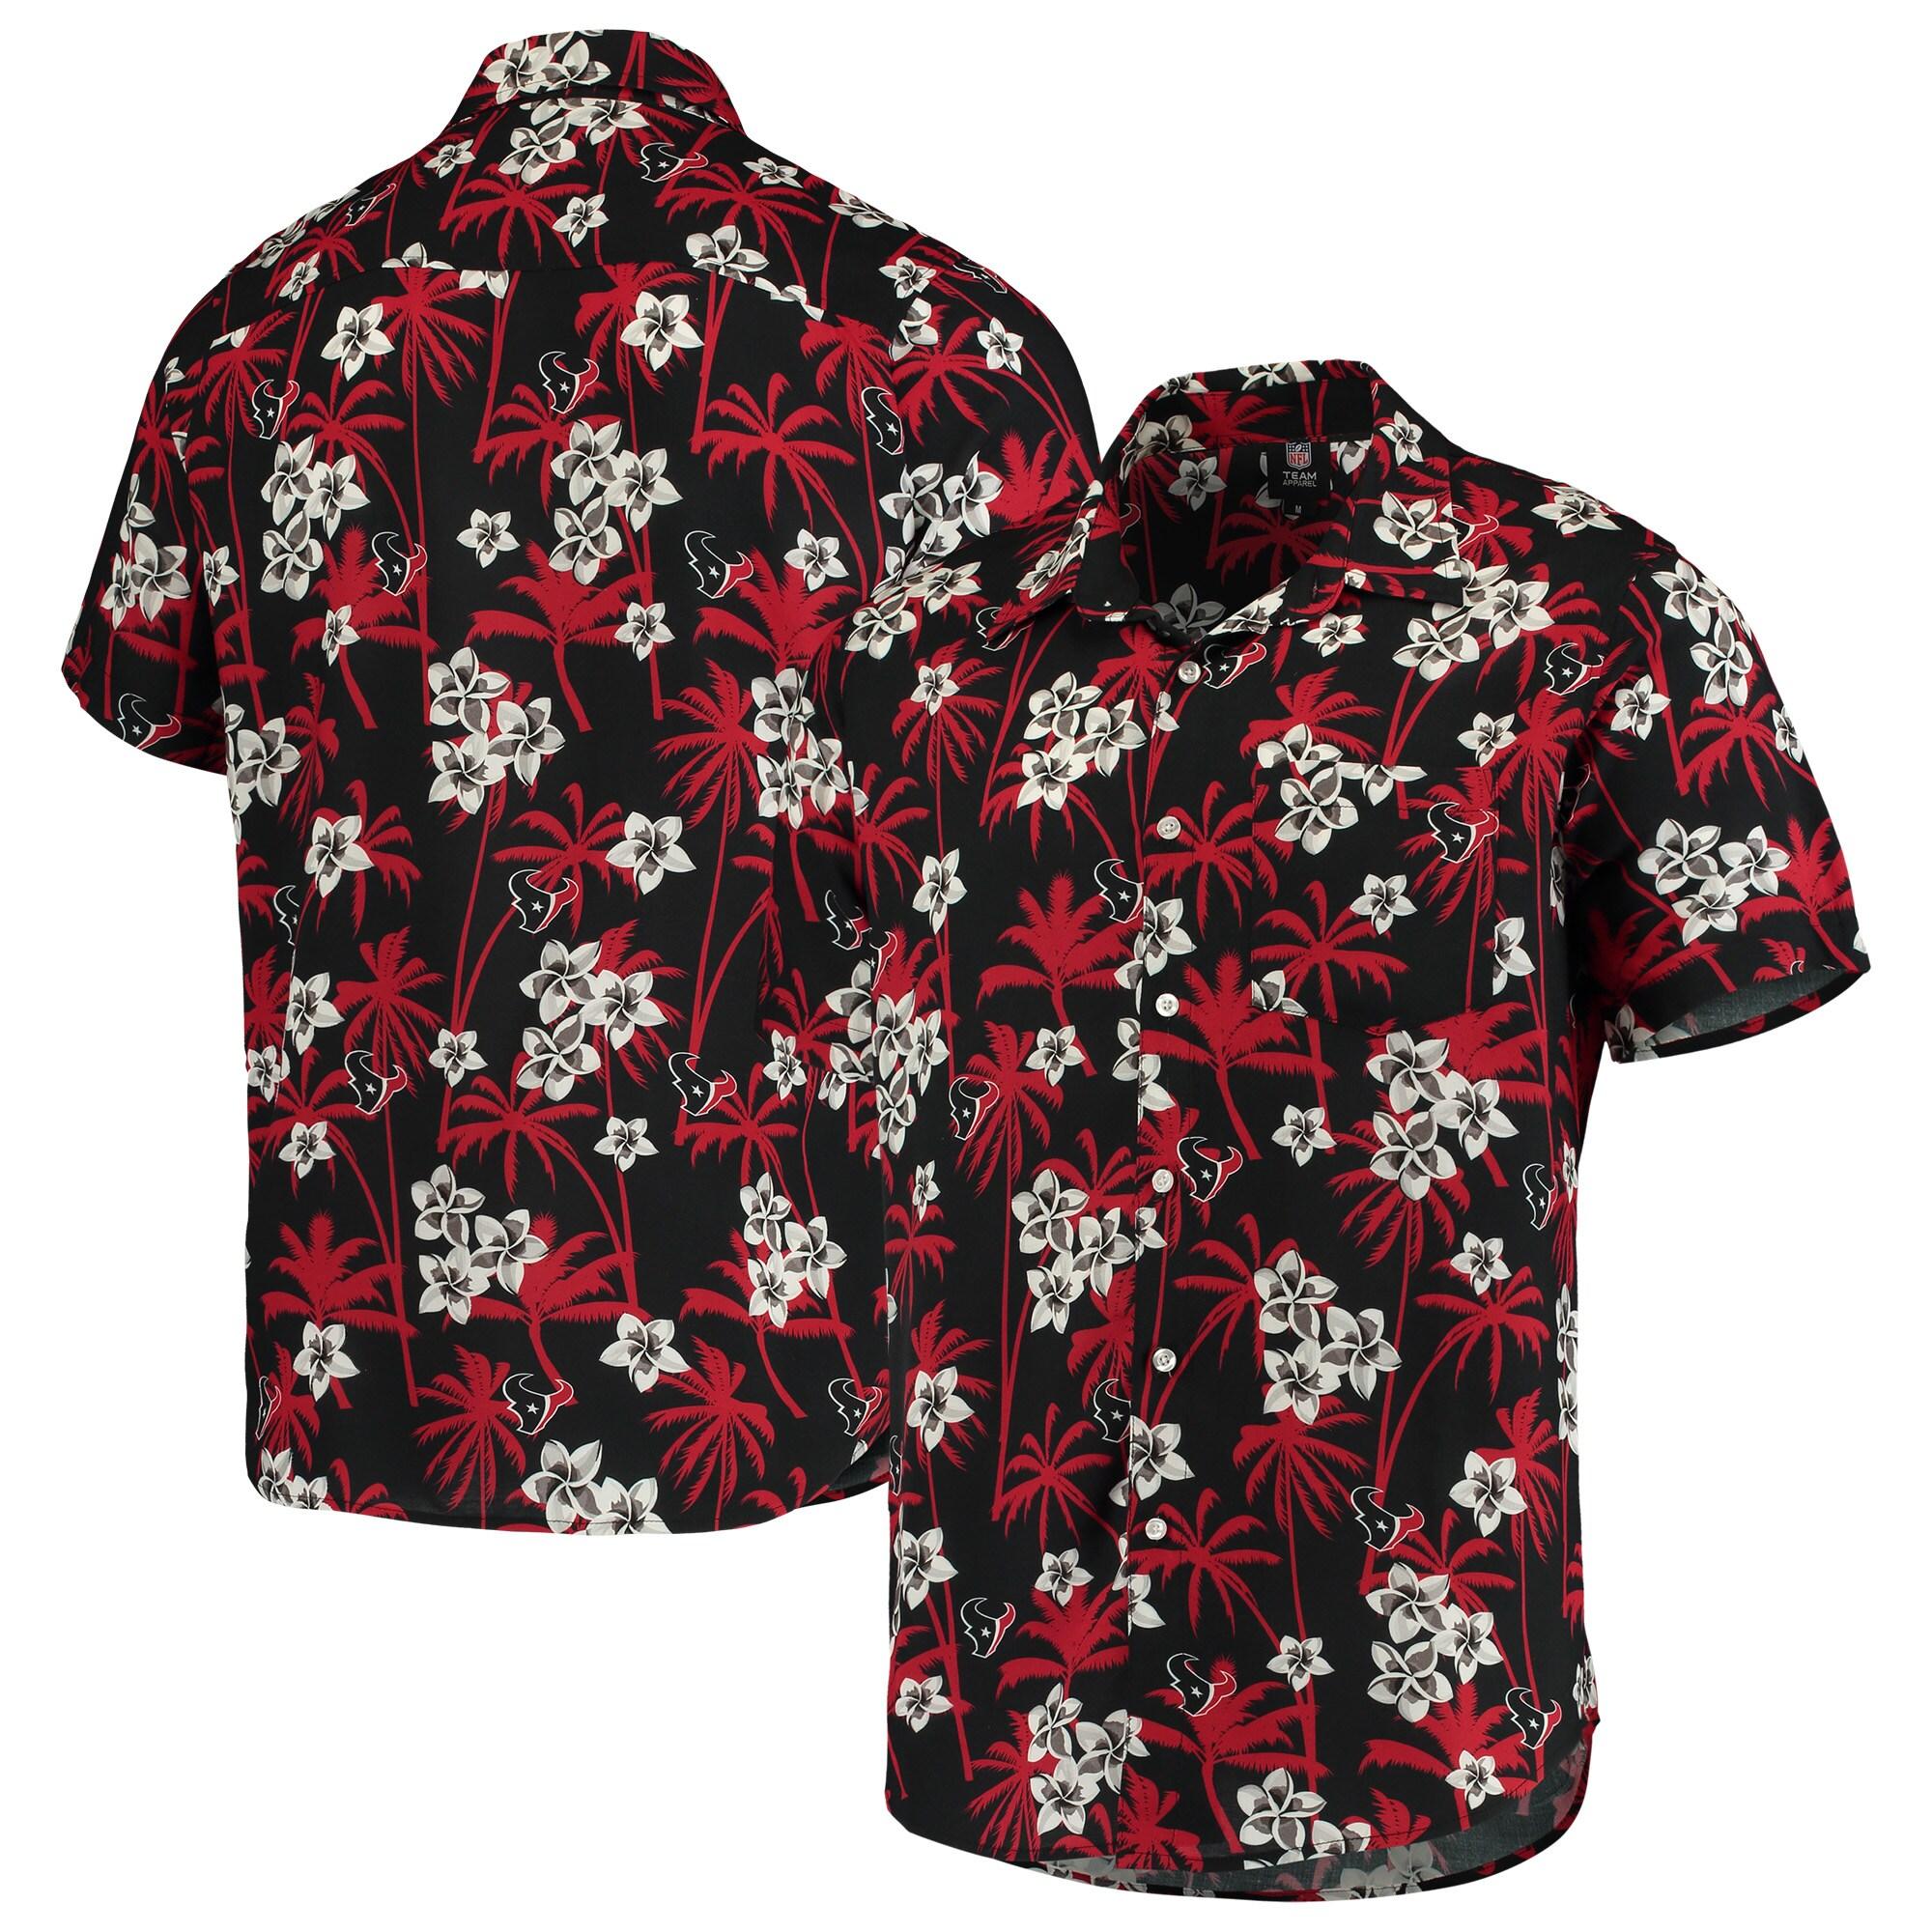 Houston Texans Floral Woven Button-Up Shirt - Navy